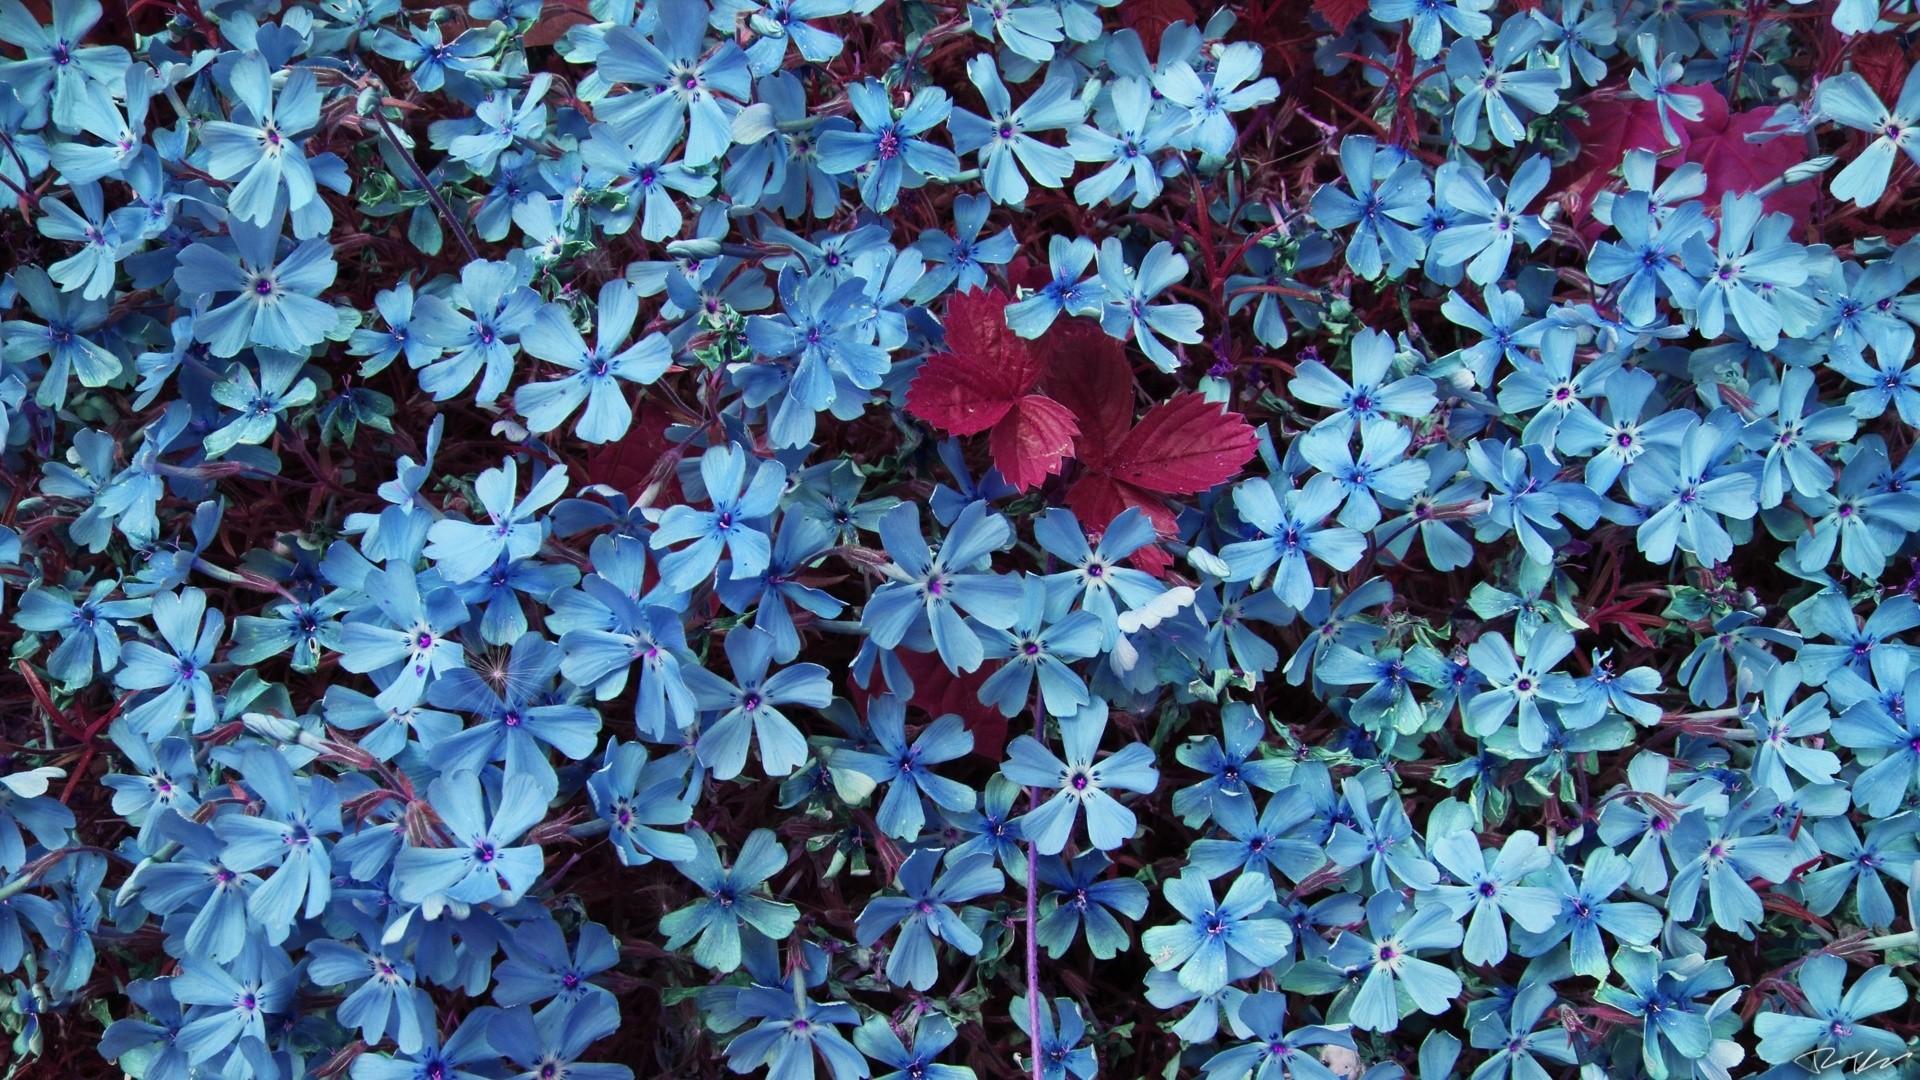 Blue Flower wallpaper photo hd